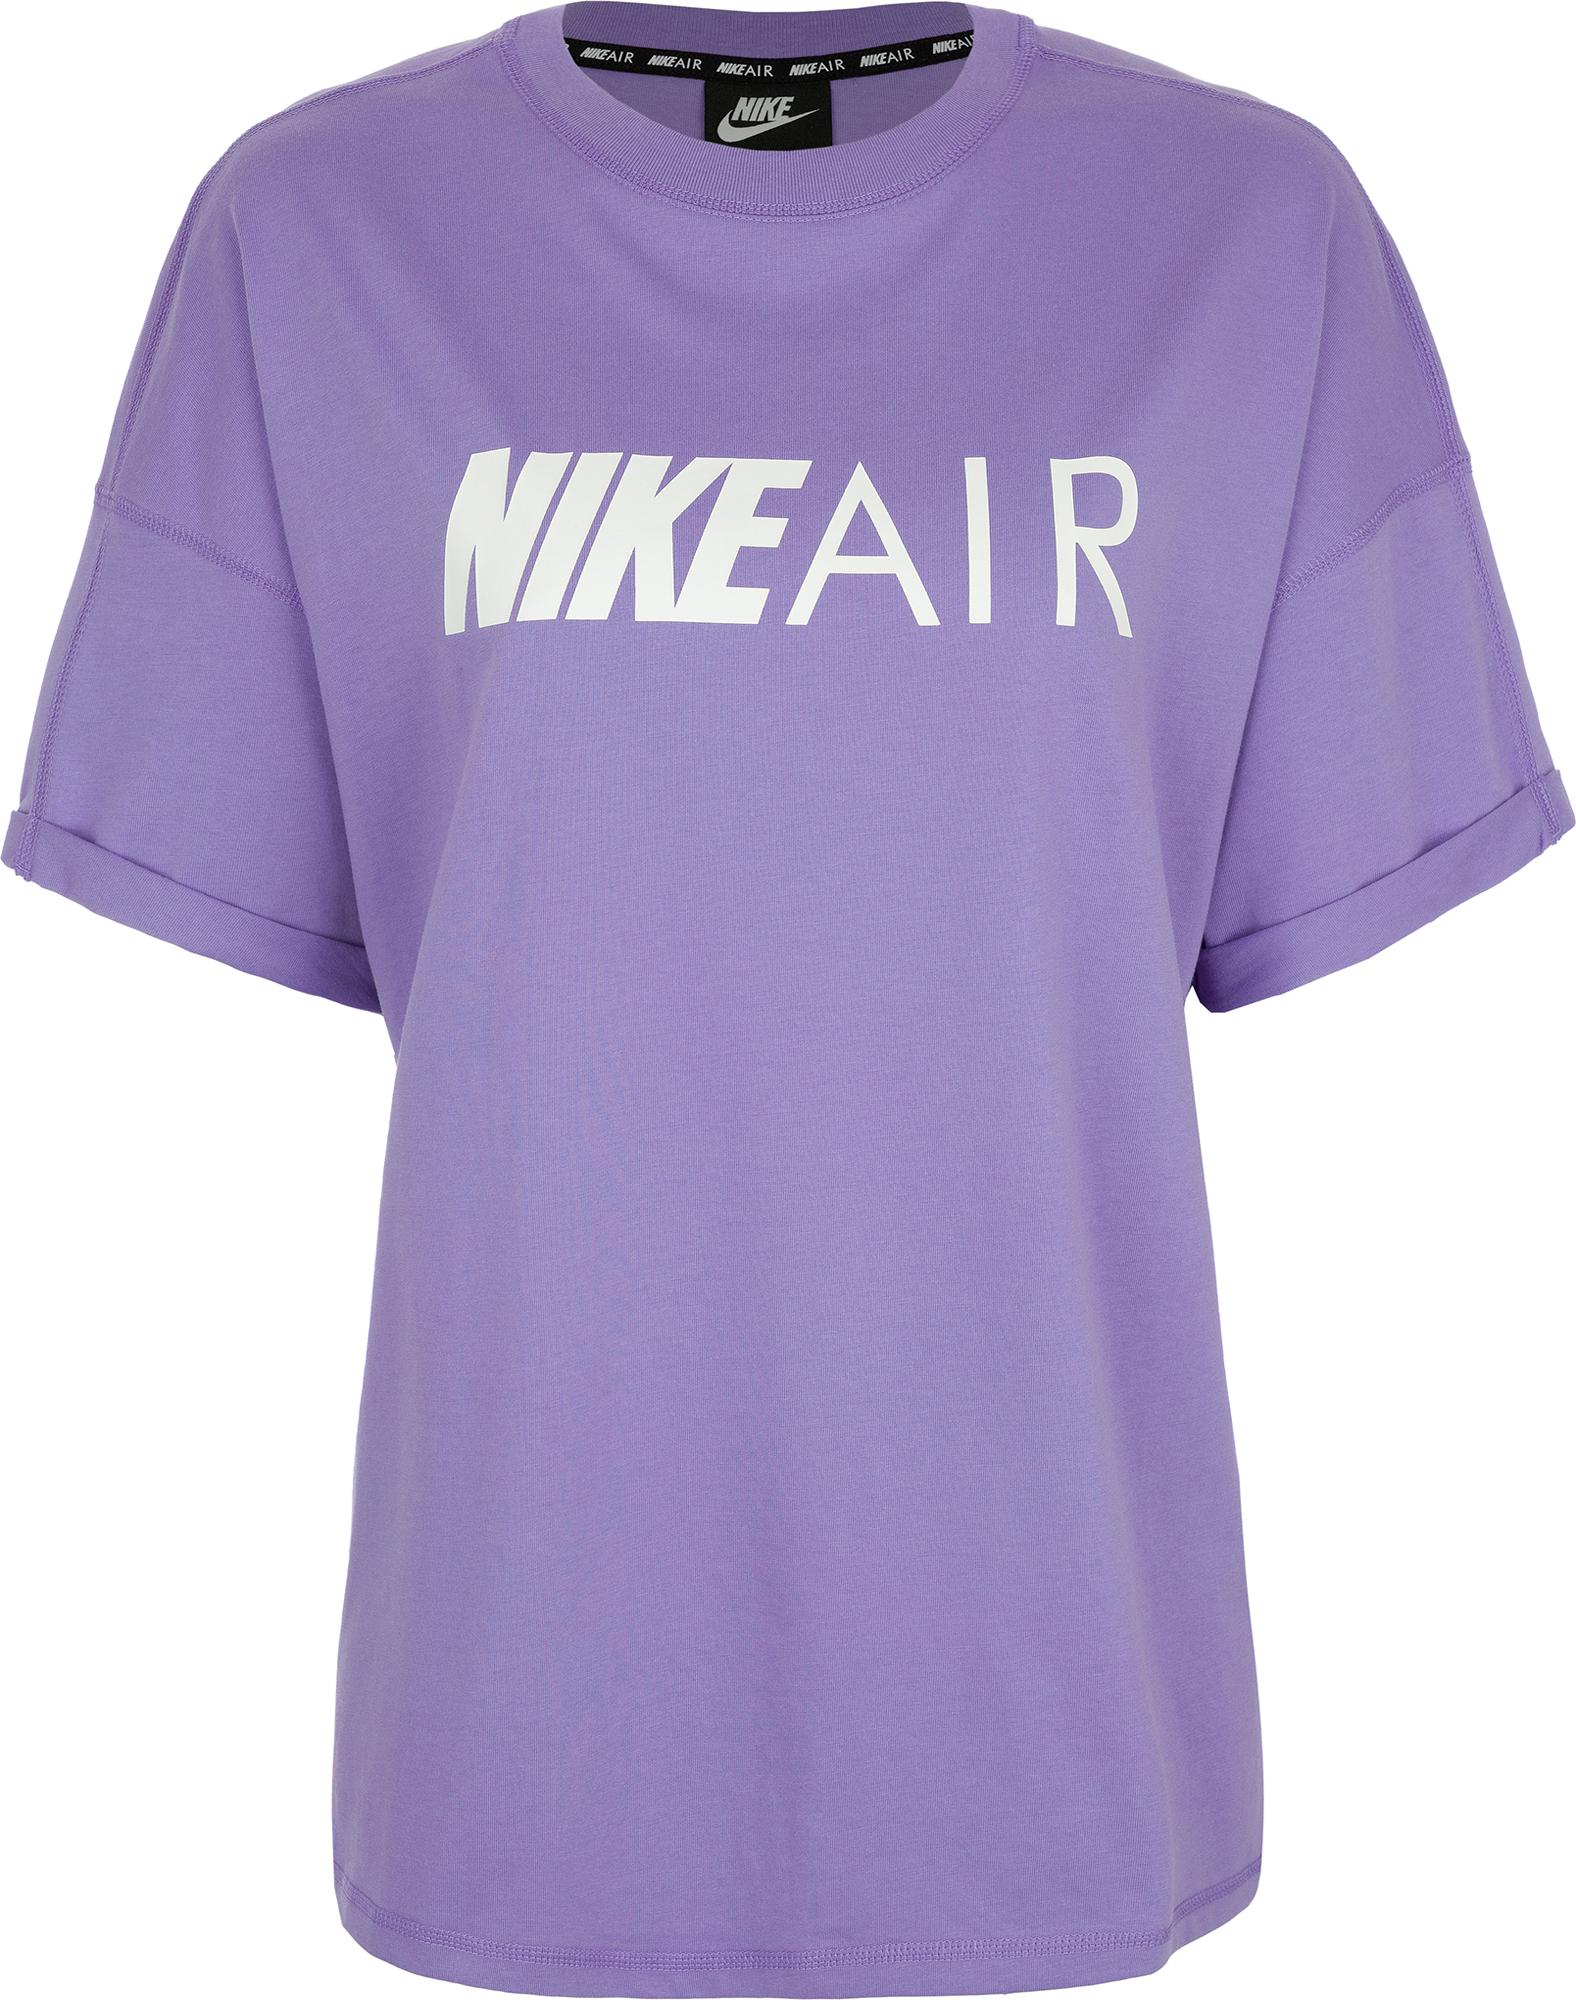 Nike Футболка женская Nike Sportswear, размер 46-48 nike бриджи женские nike sportswear vintage размер 48 50